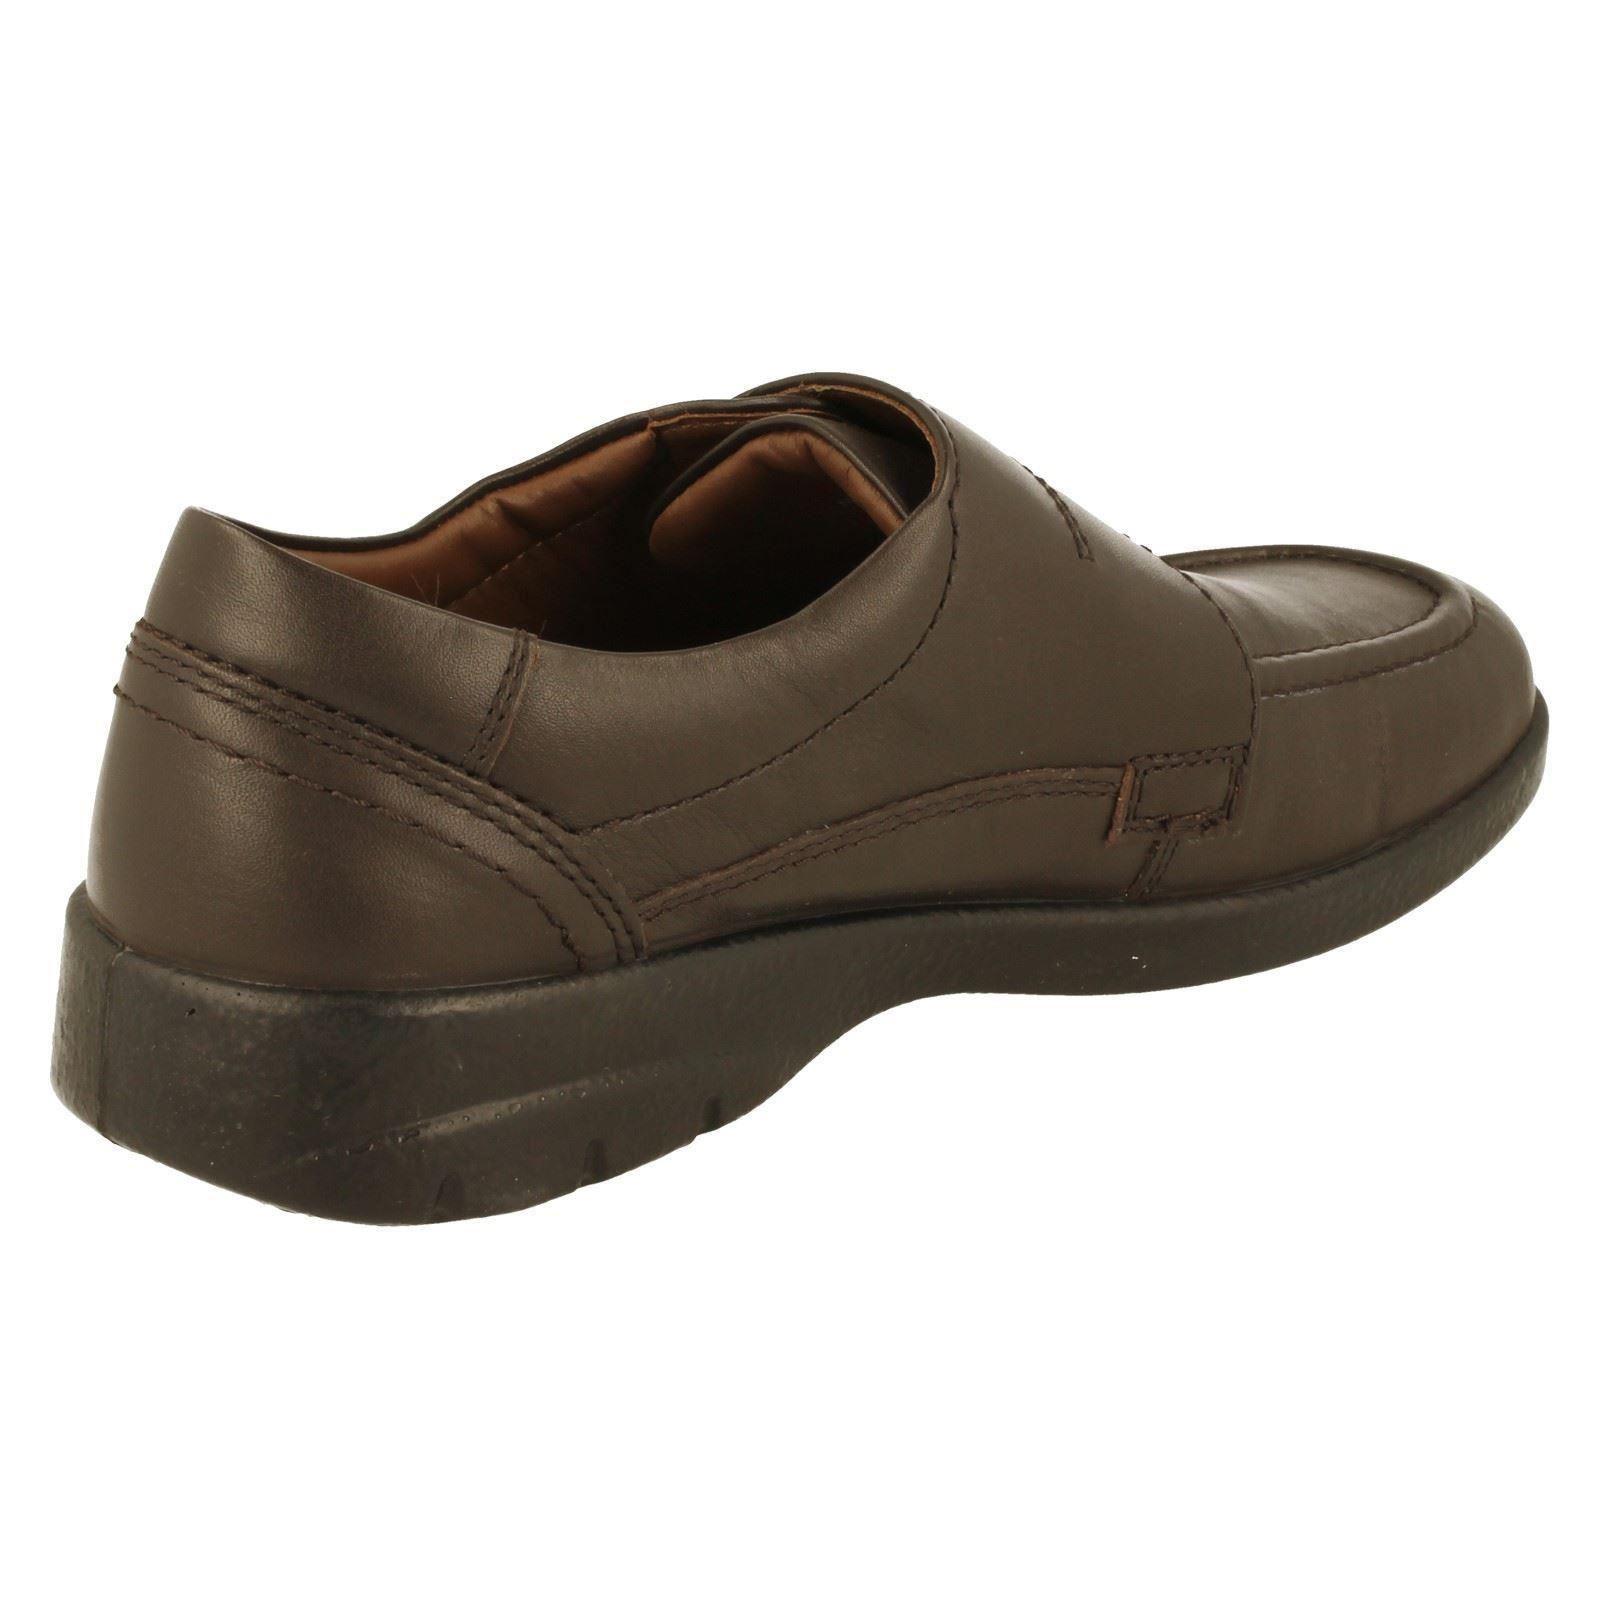 Herren Padders Schuhes Solar-W G/H Fit Style Solar-W Schuhes cf5707